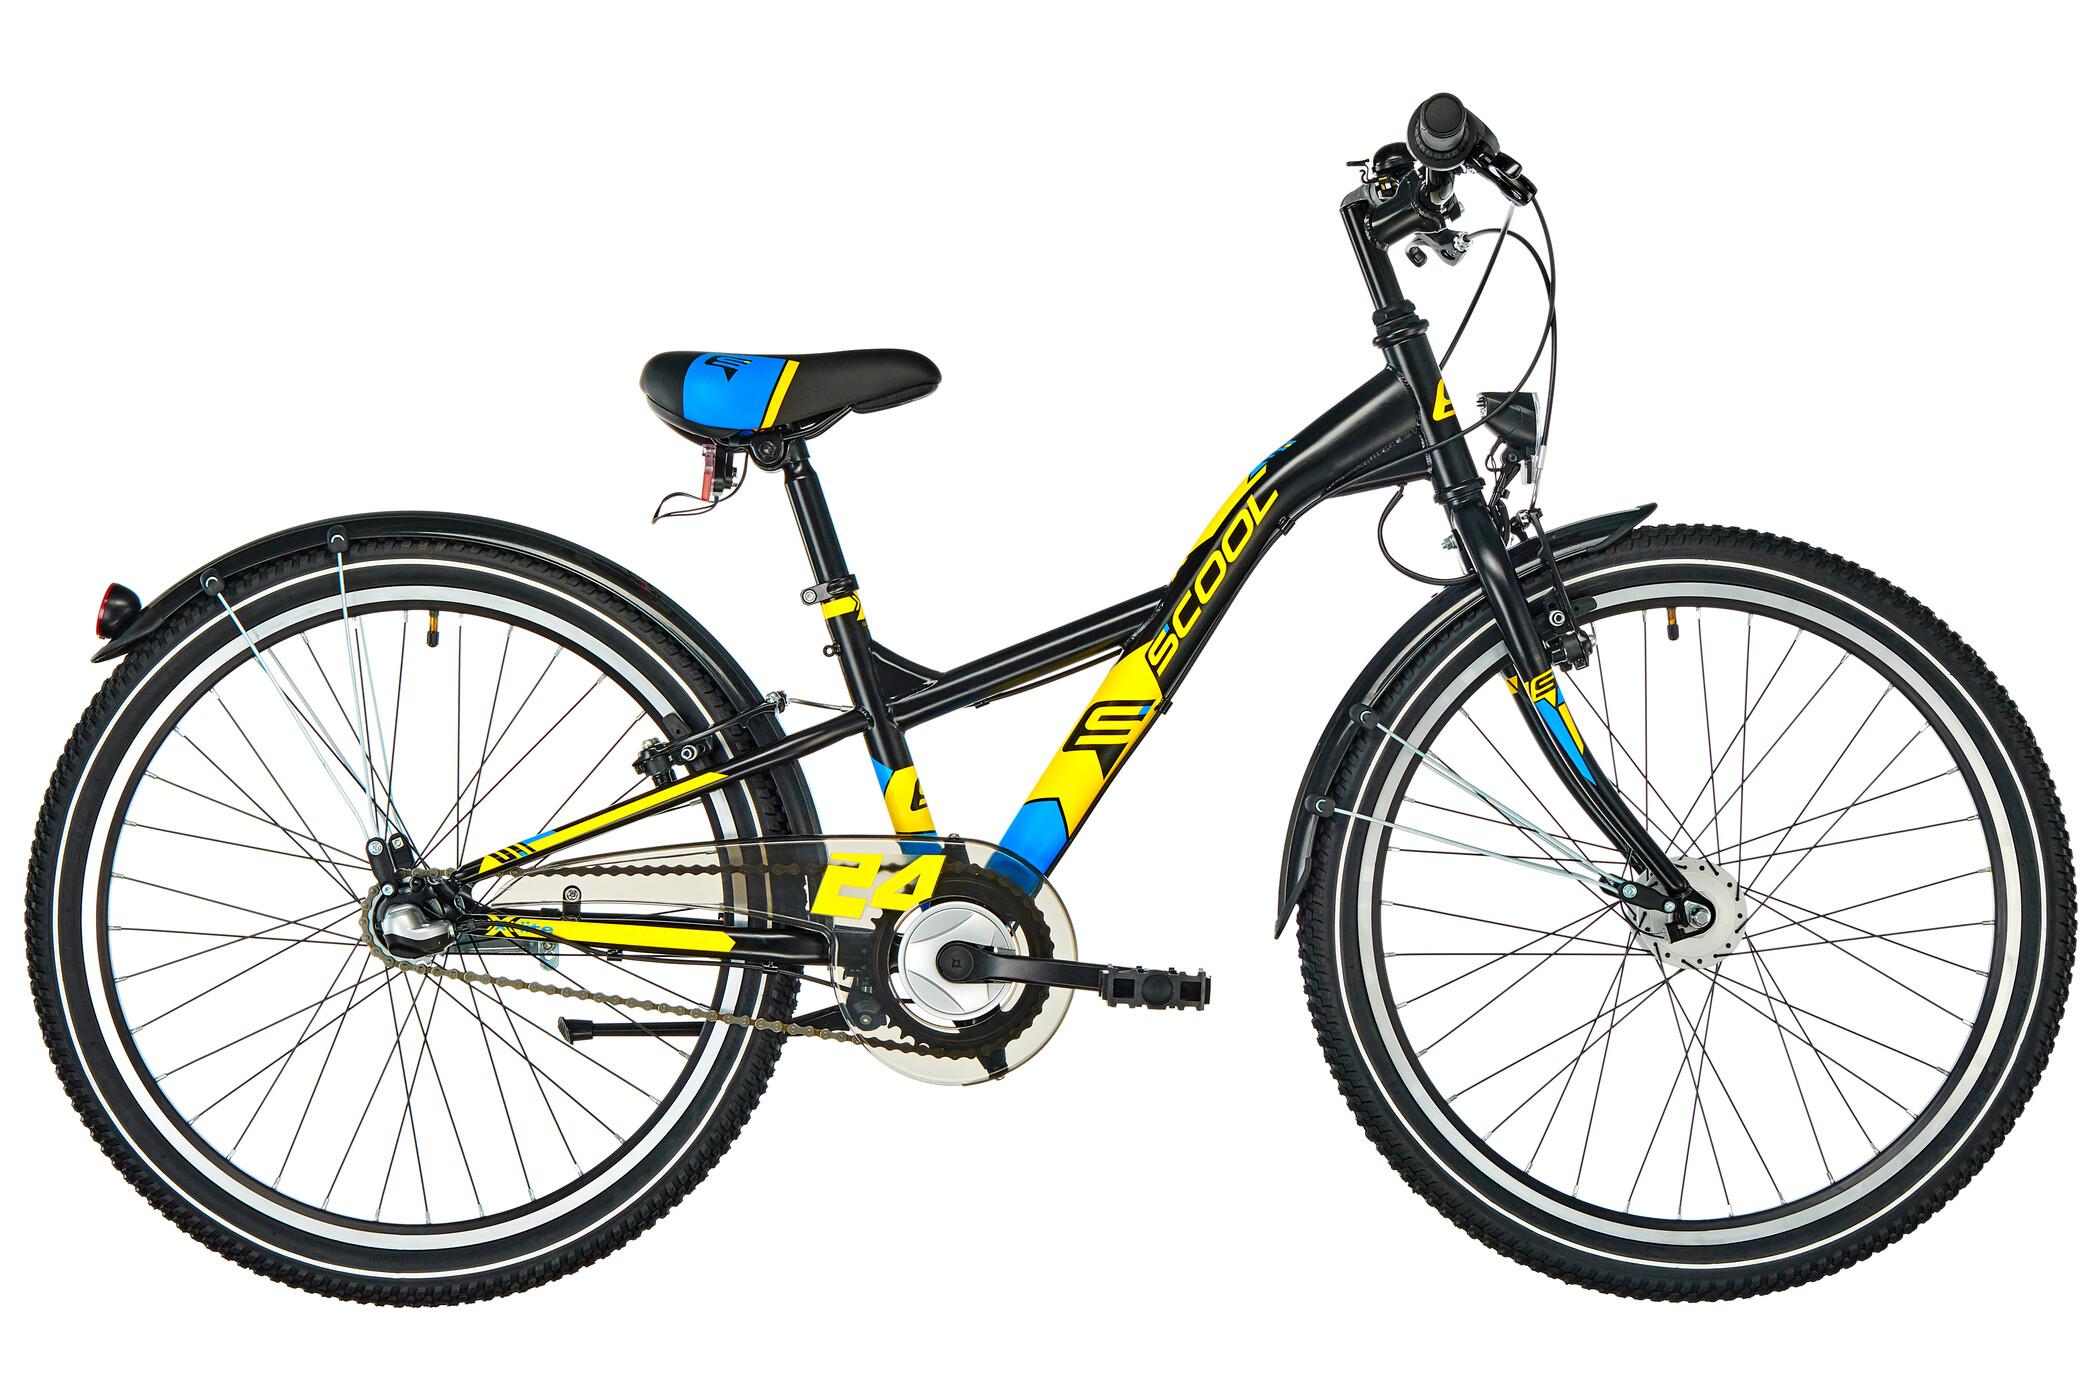 s'cool XXlite 24 3-S Steel Børn, black/yellow matt (2020) | City